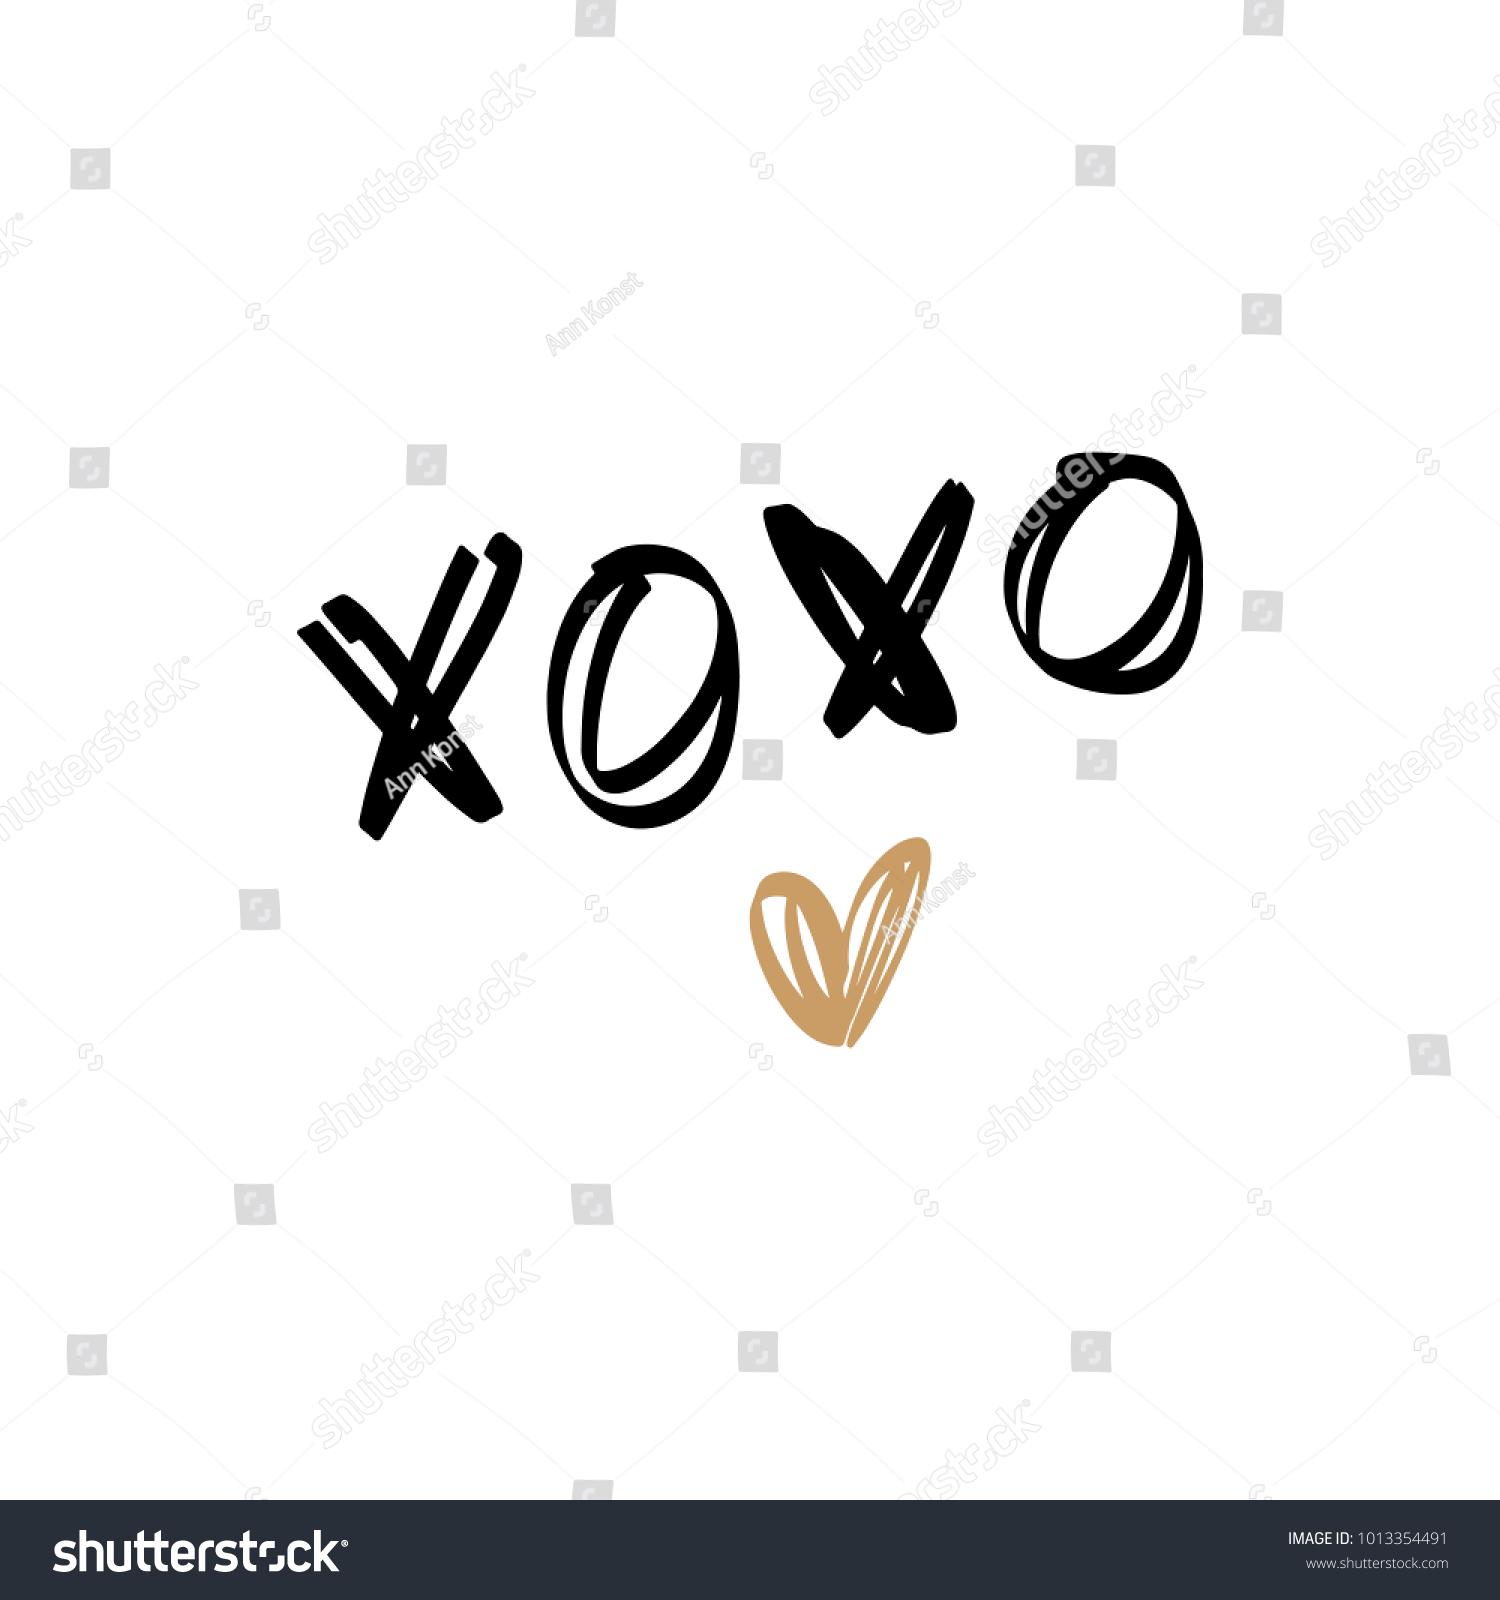 Golden Heart Hugs And Kisses Sign Letters Decor Element Sticker